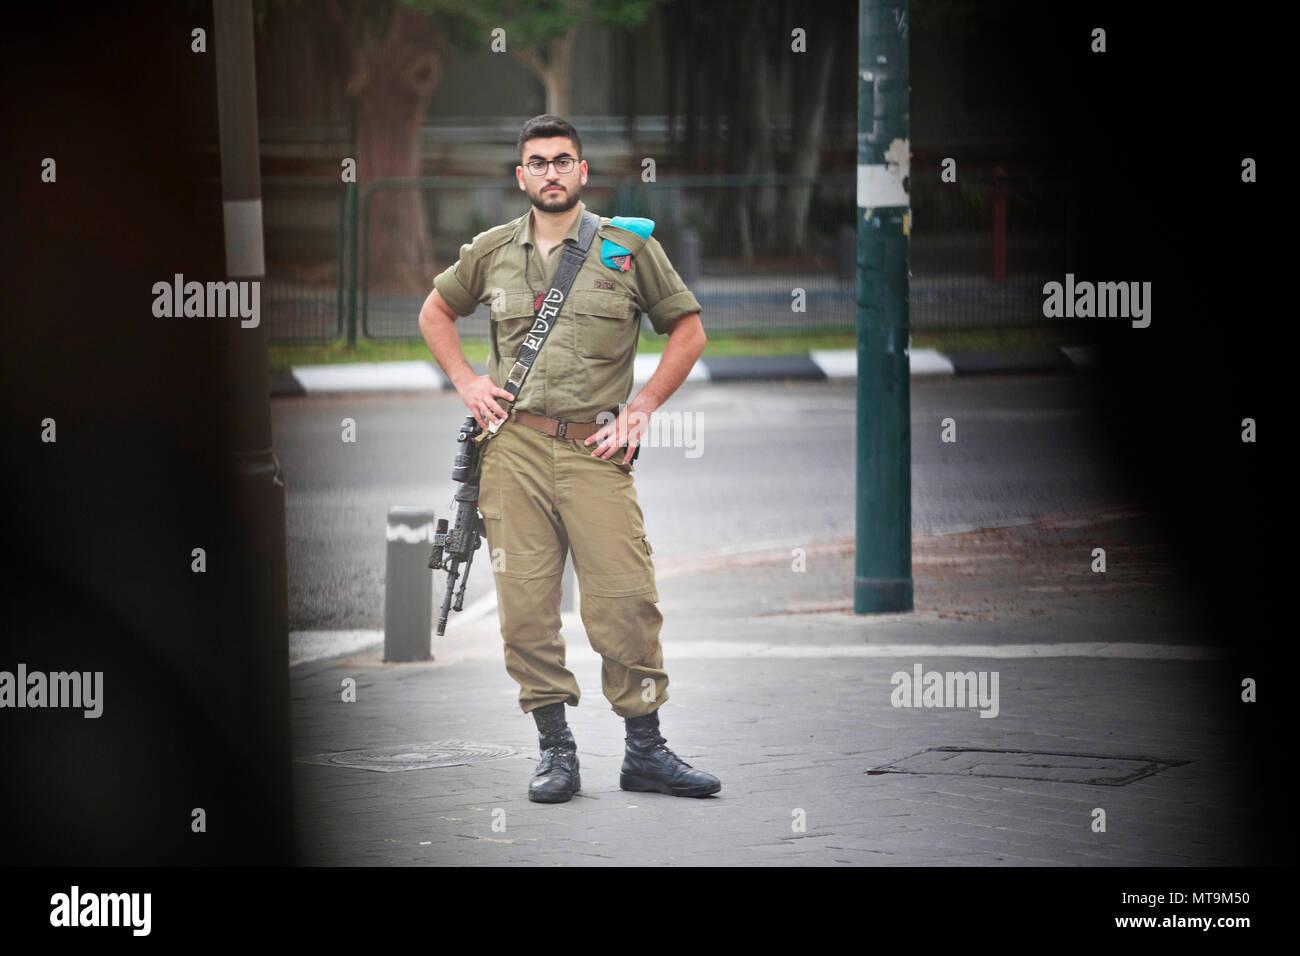 Tel Aviv, soldier - Stock Image